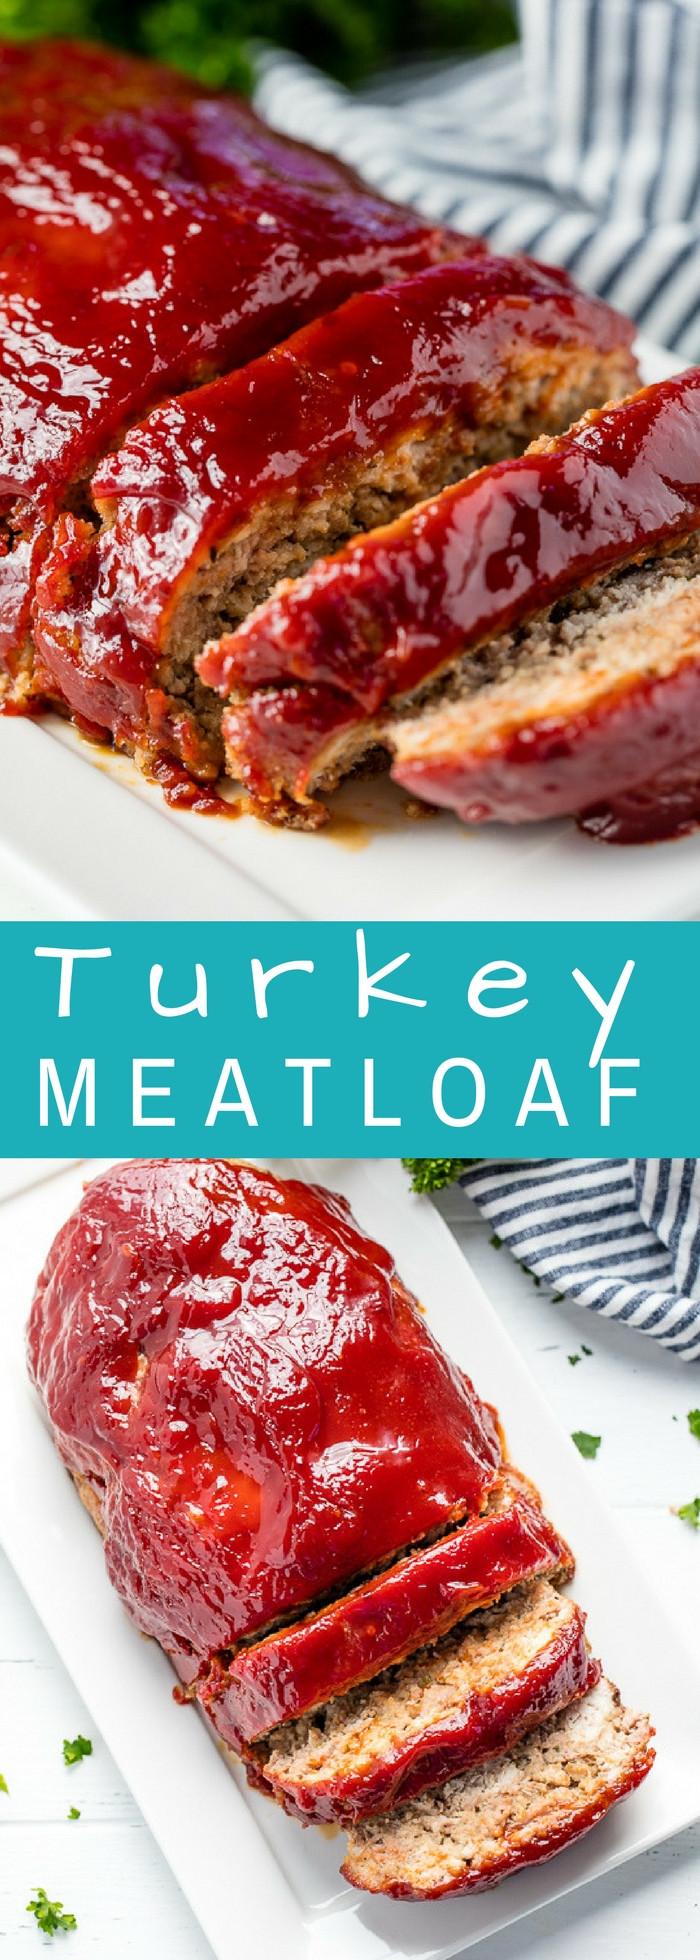 Turkey Meatloaf Healthy  Turkey Meatloaf